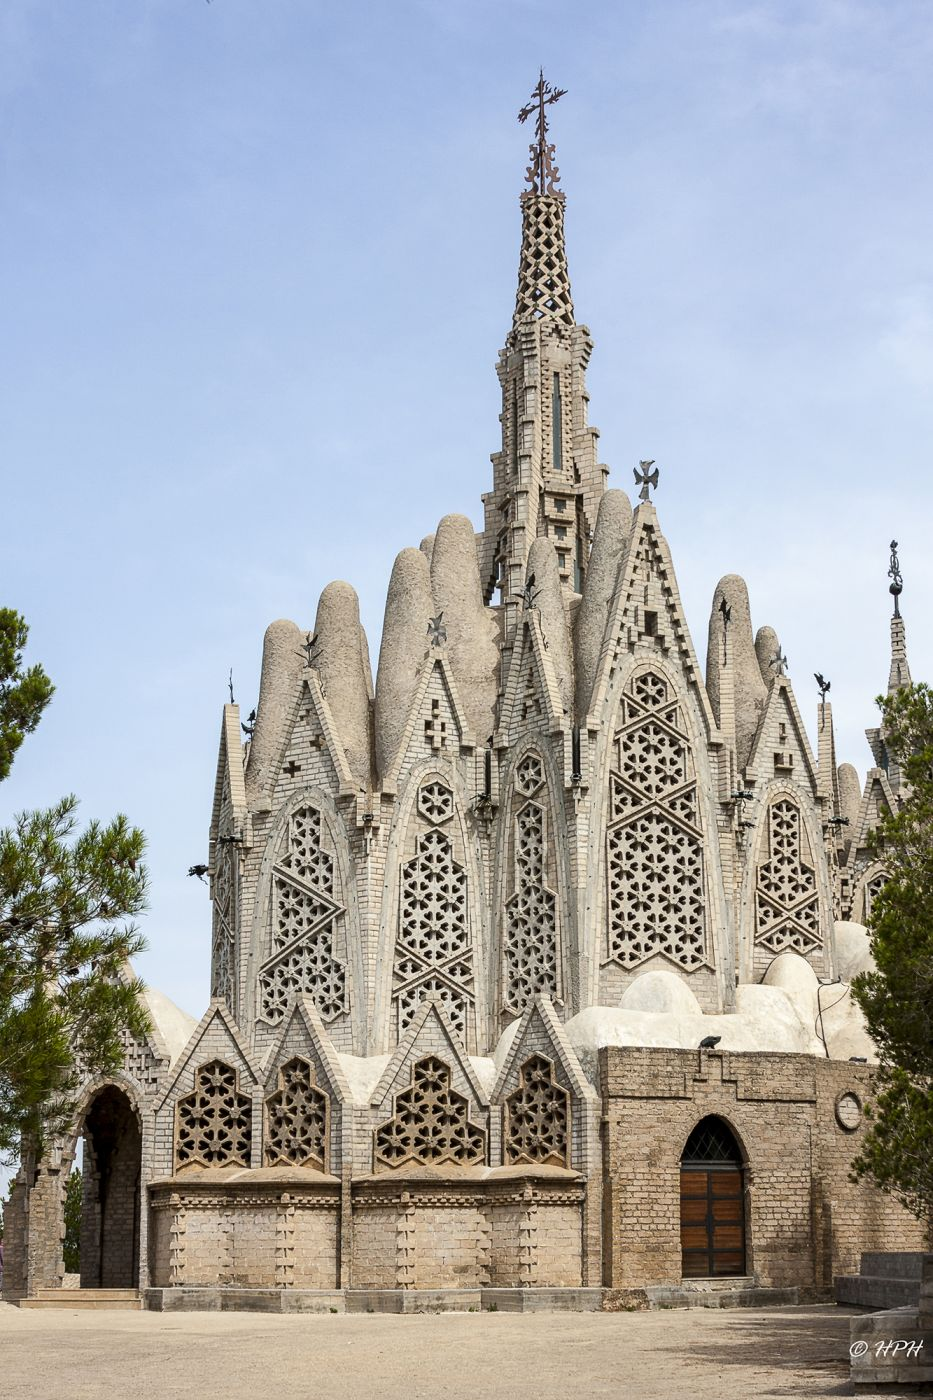 Santuari de la Mare de Déu de Montserrat, Spain